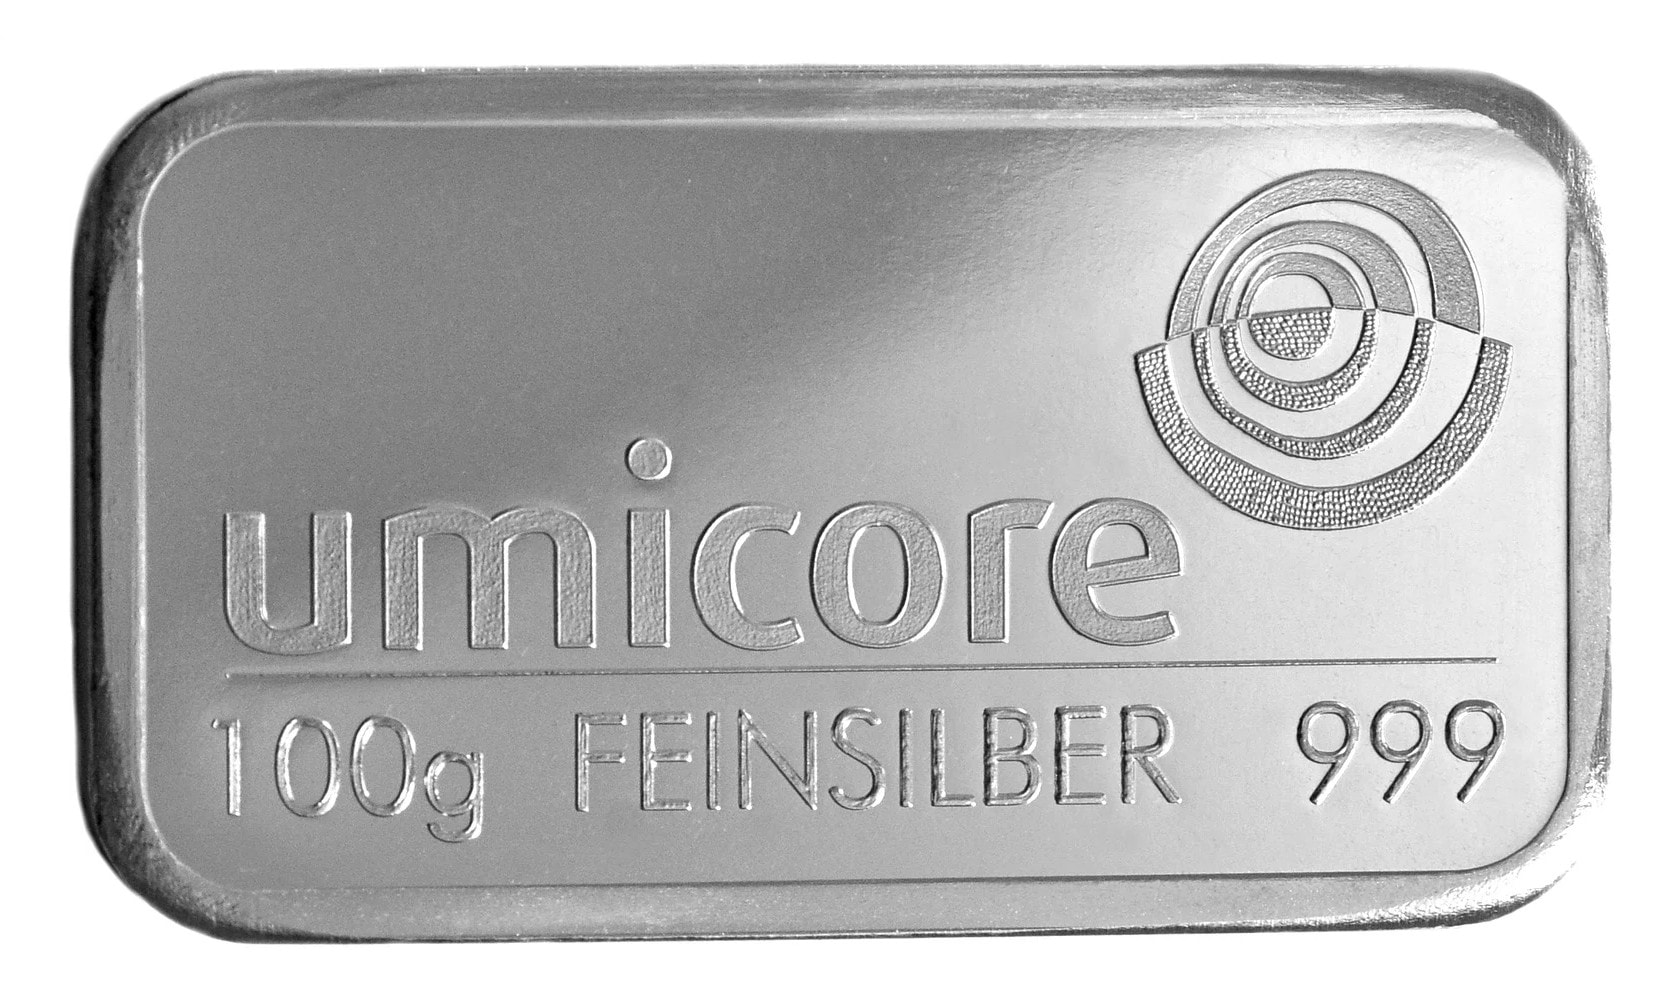 100g - 100 Gram Fine 999.0 Umicore Silver Bullion Bar #